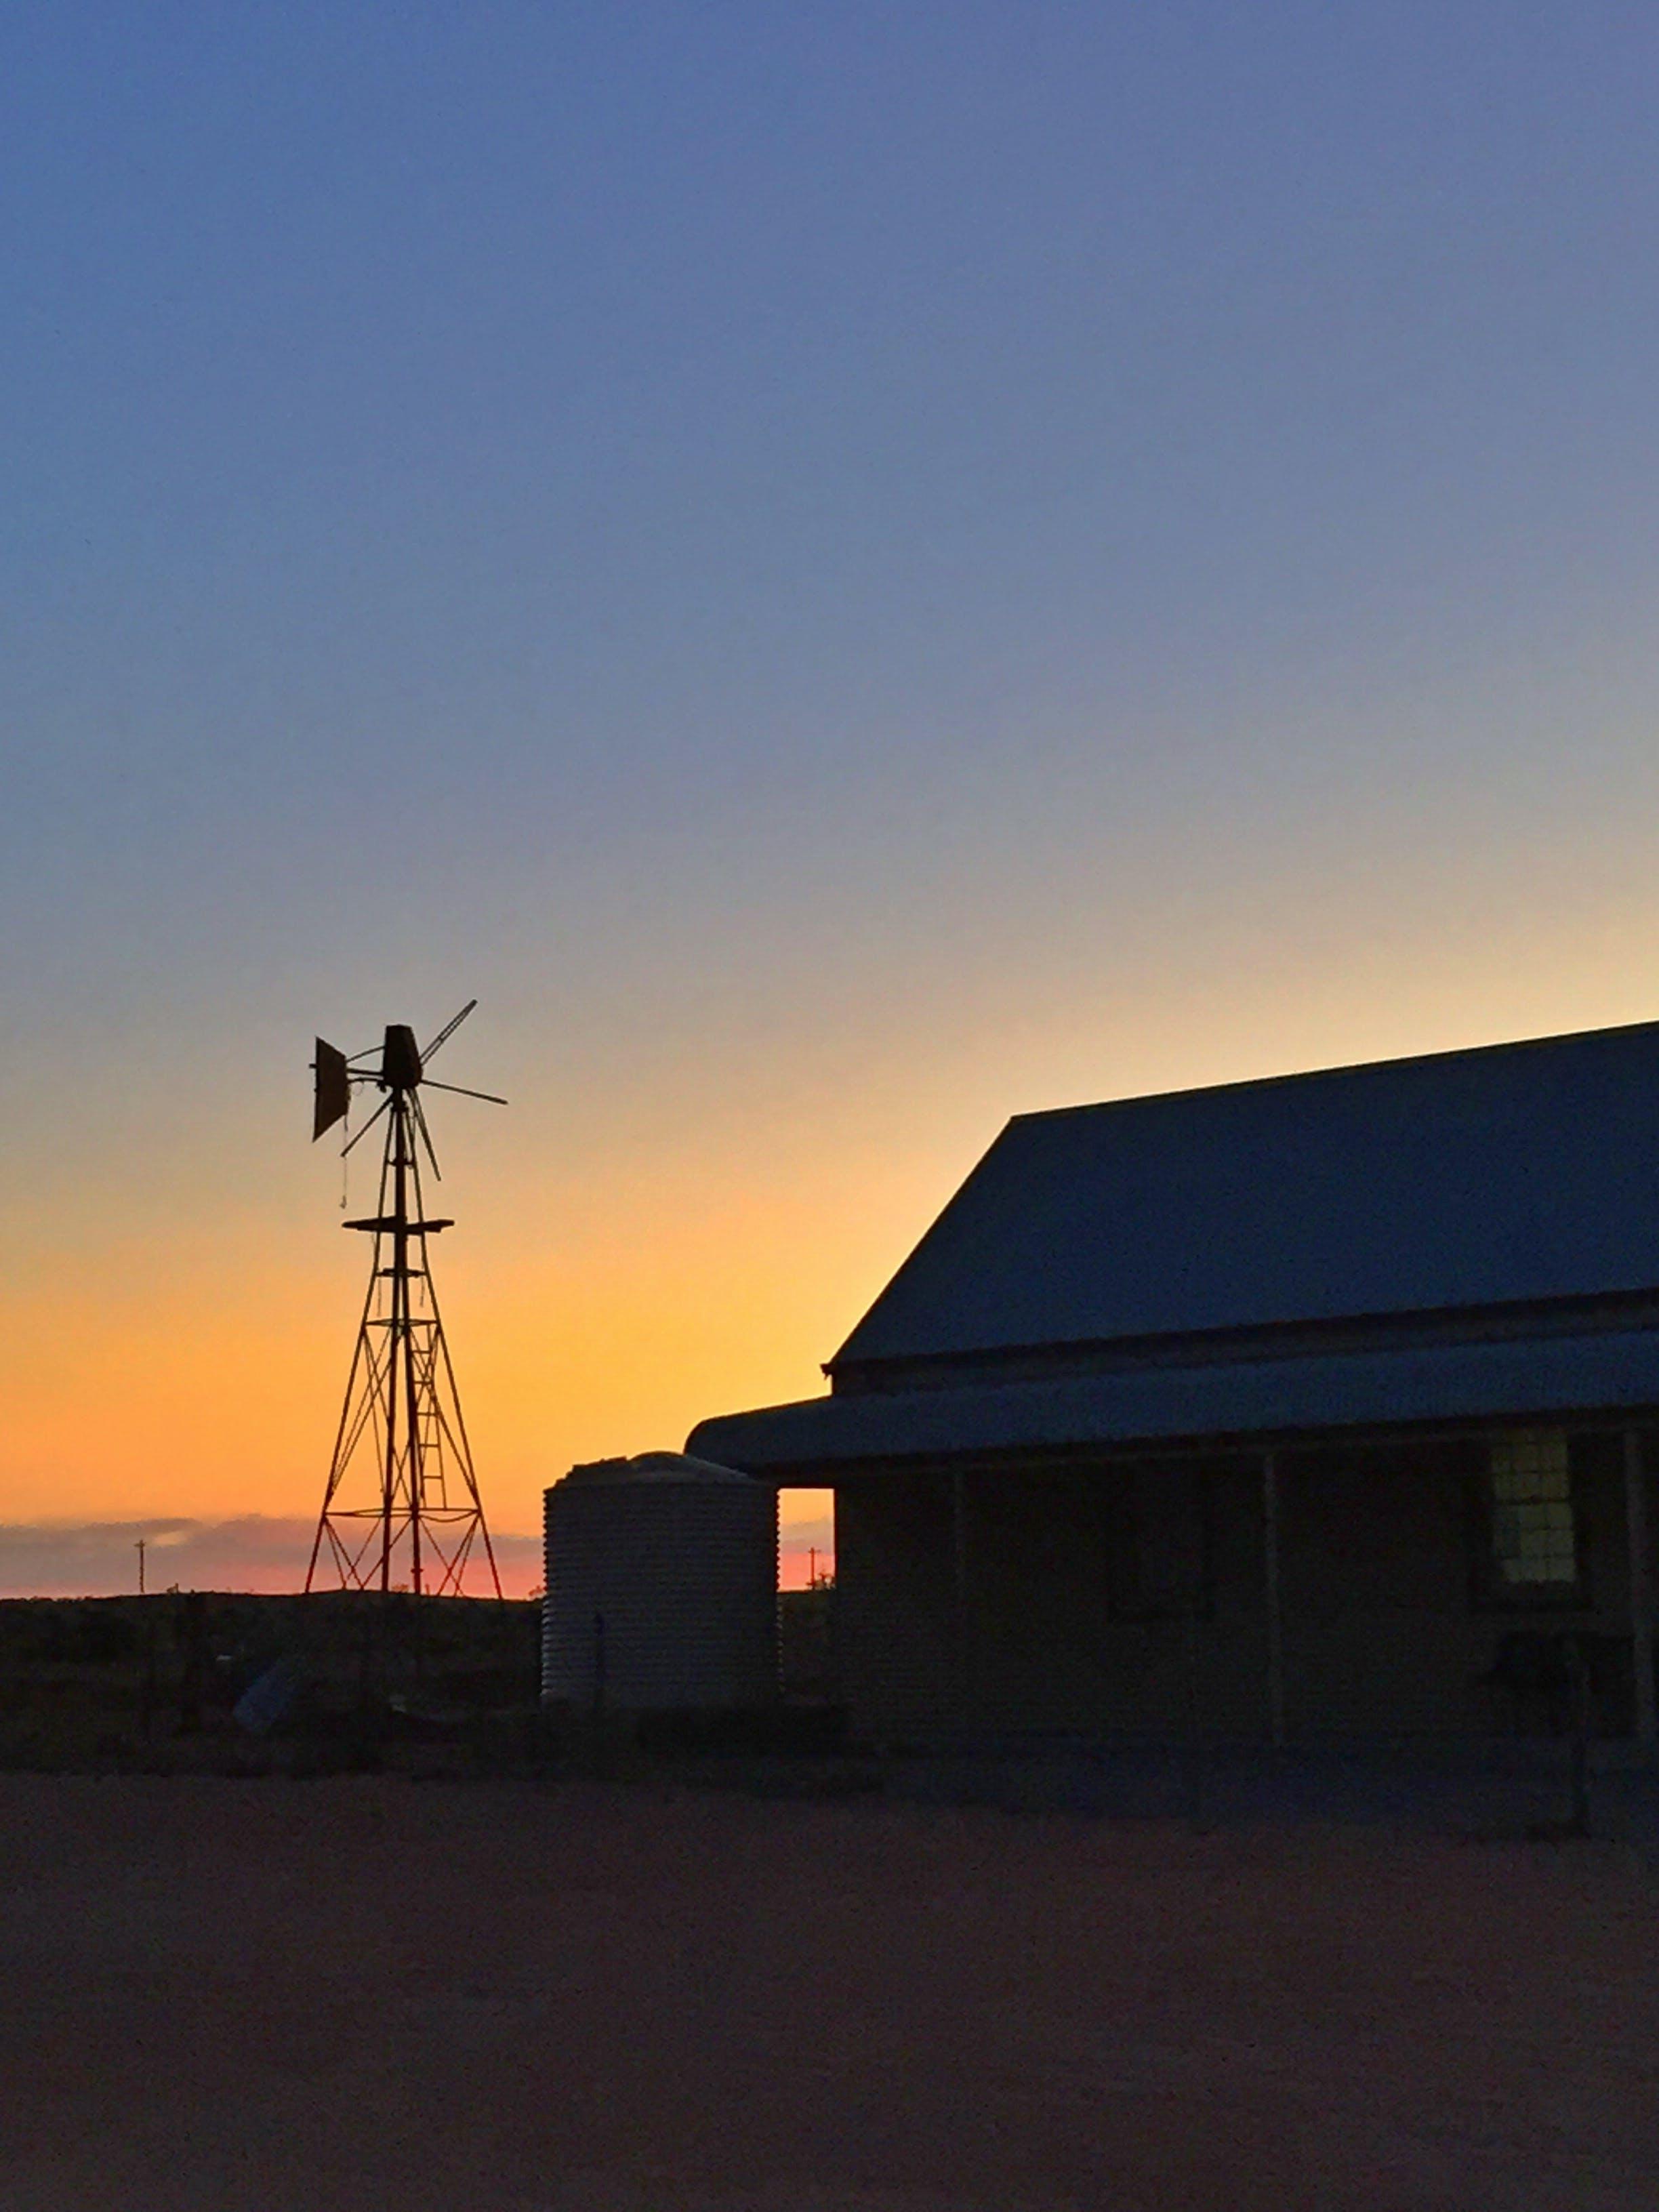 Free stock photo of sunset, desert, silver, windmill